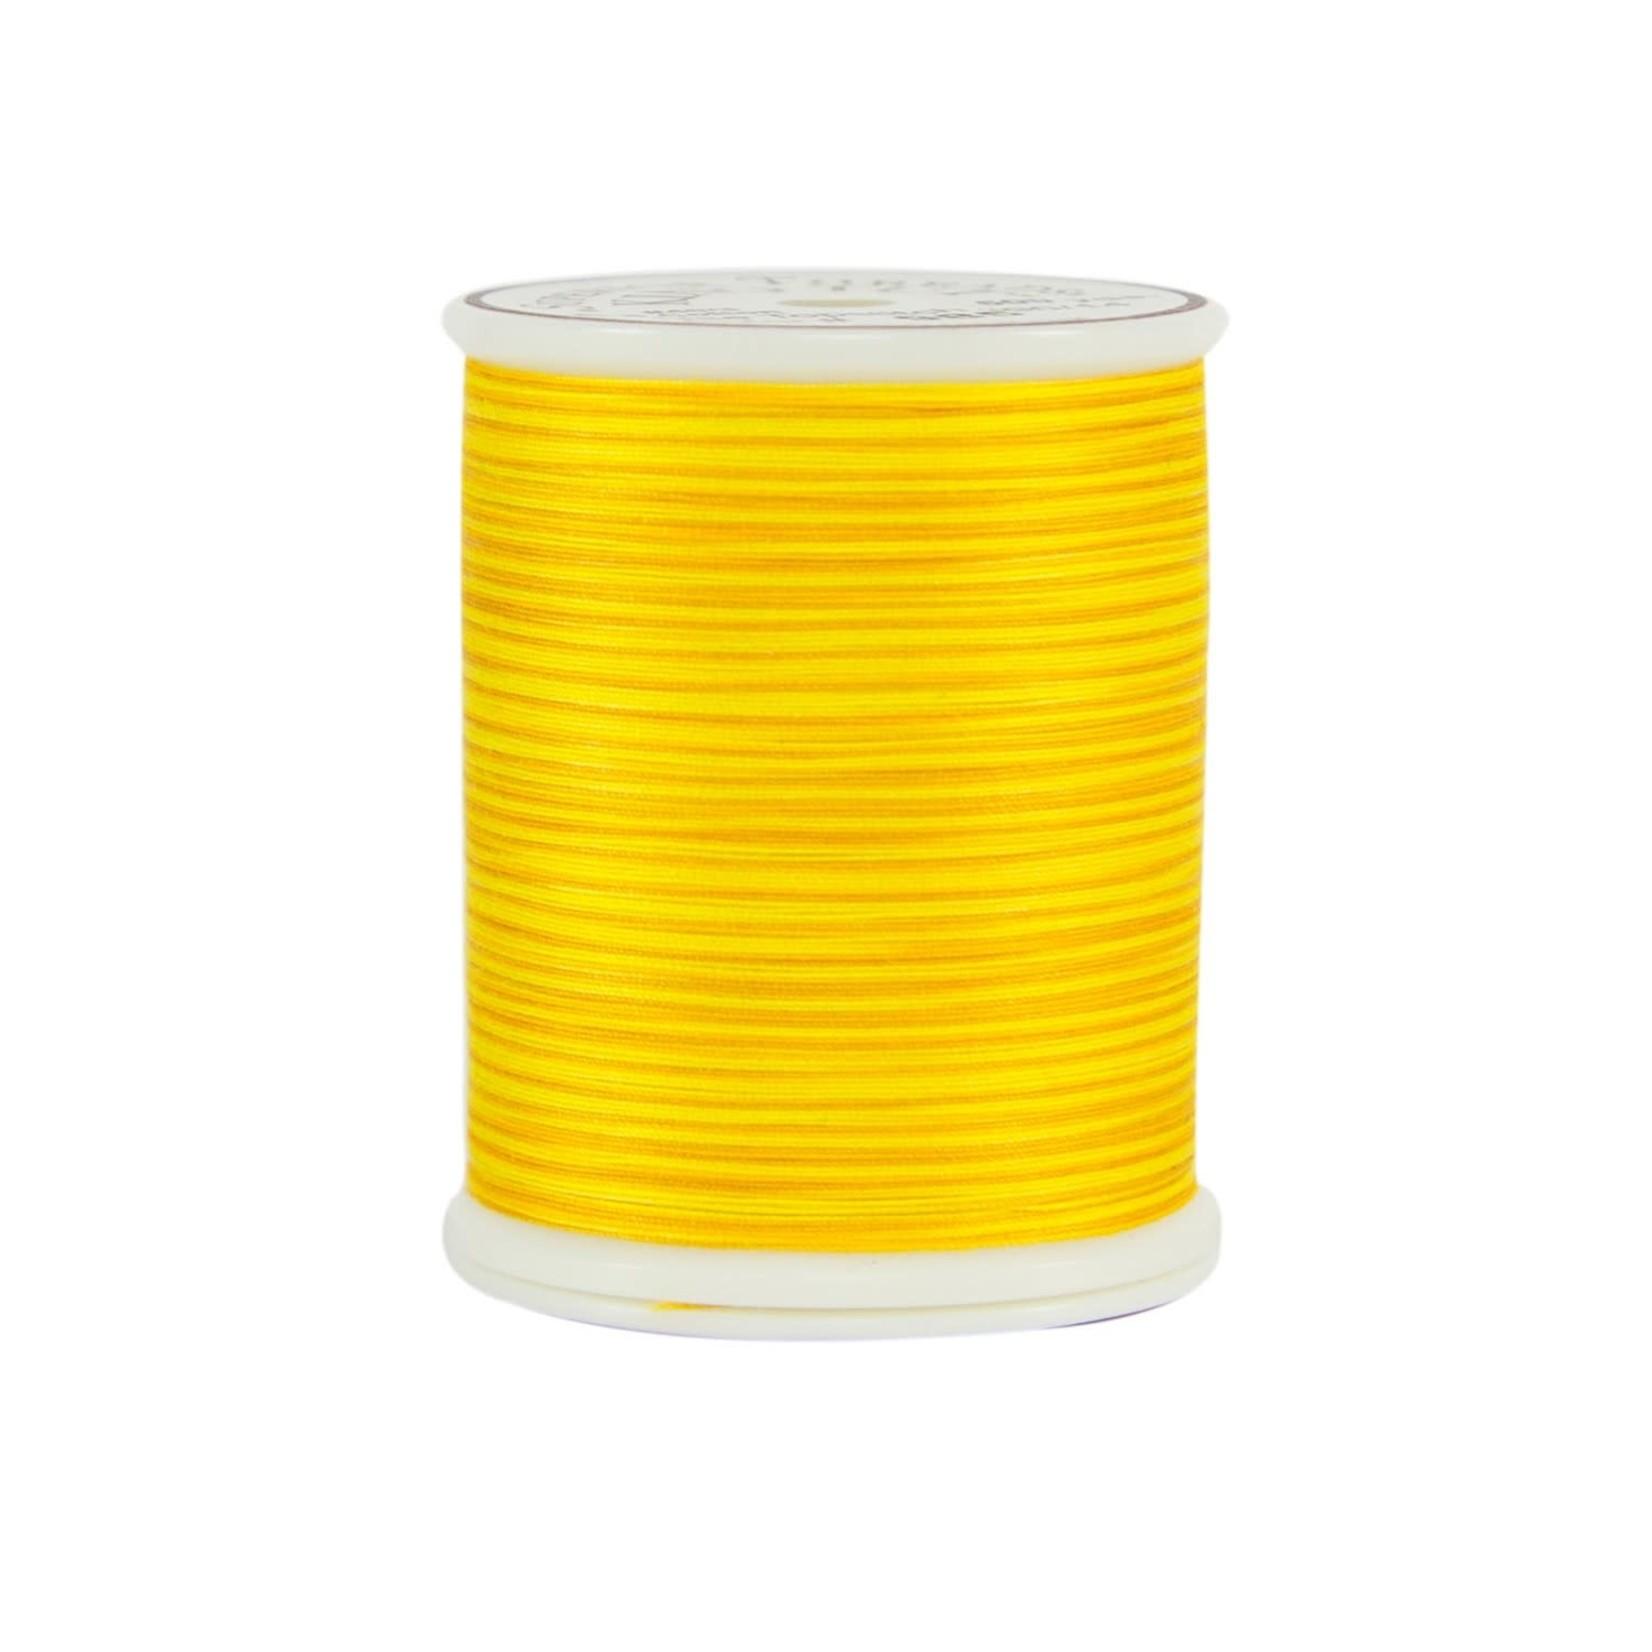 Superior Threads King Tut - #40 - 457 m - 0985 Shekels